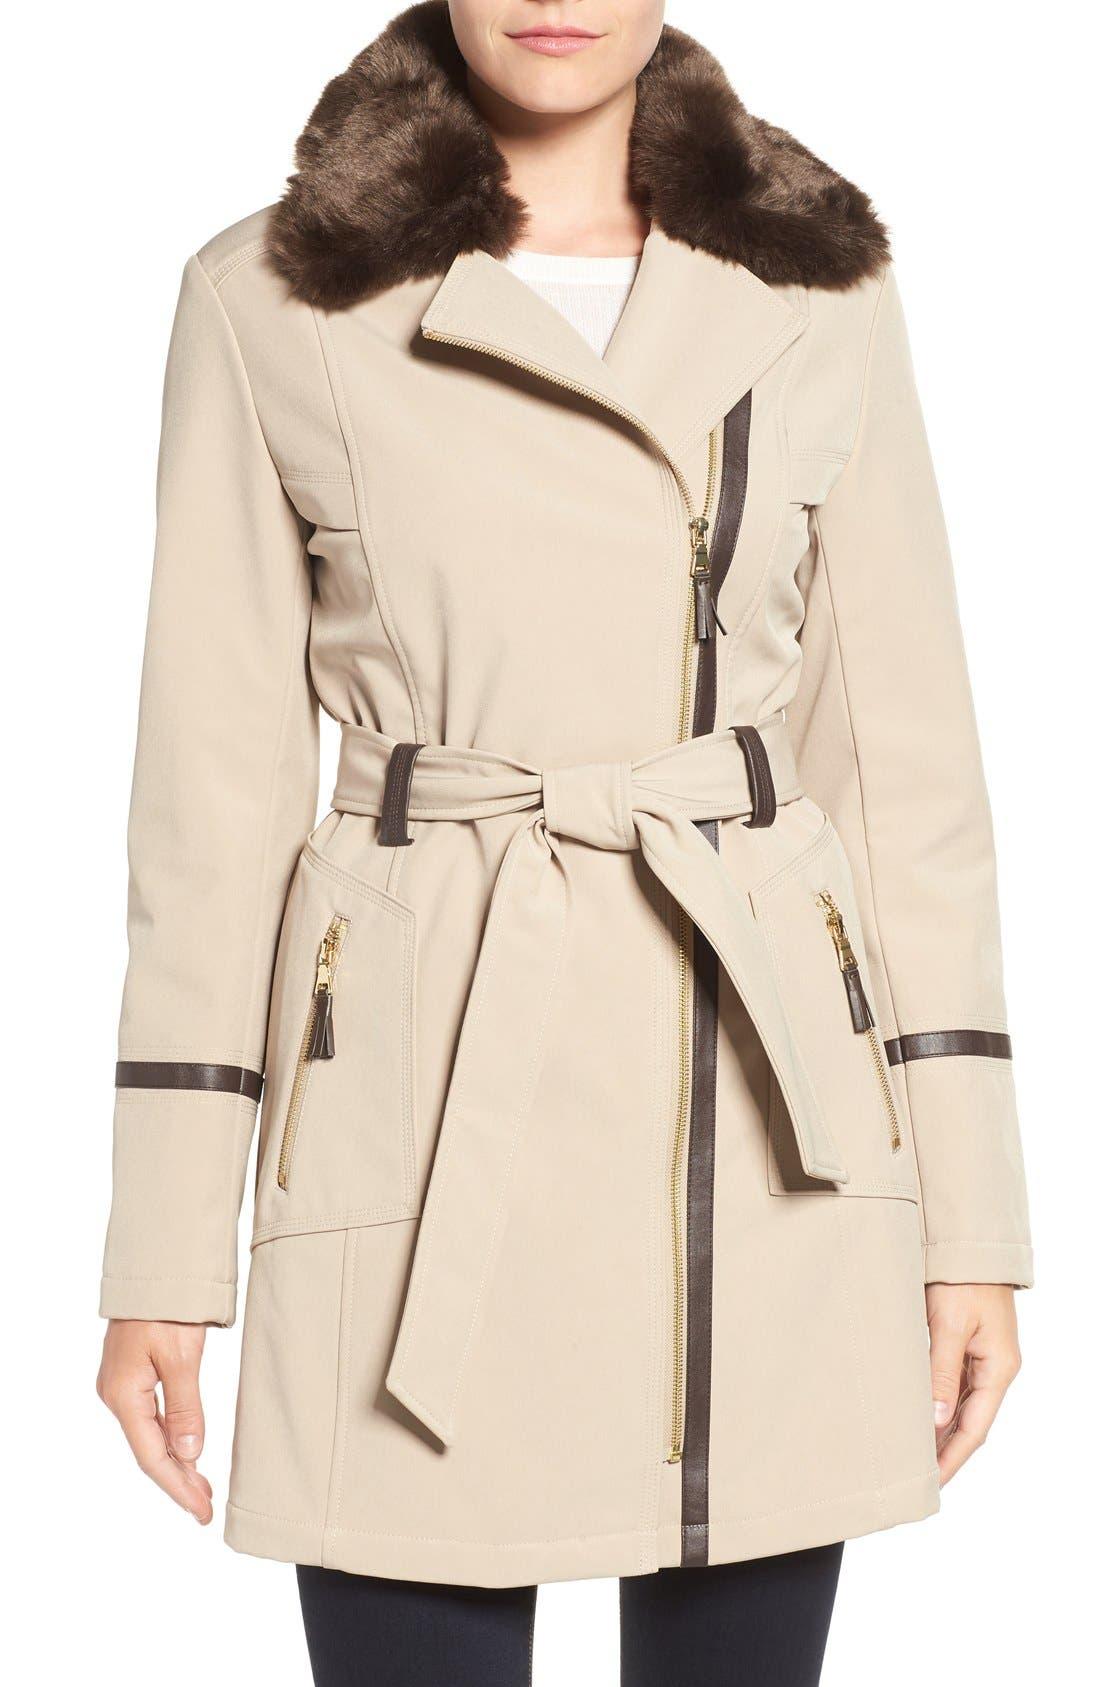 Alternate Image 1 Selected - Via Spiga Detachable Faux Fur Collar Belted Soft Shell Coat